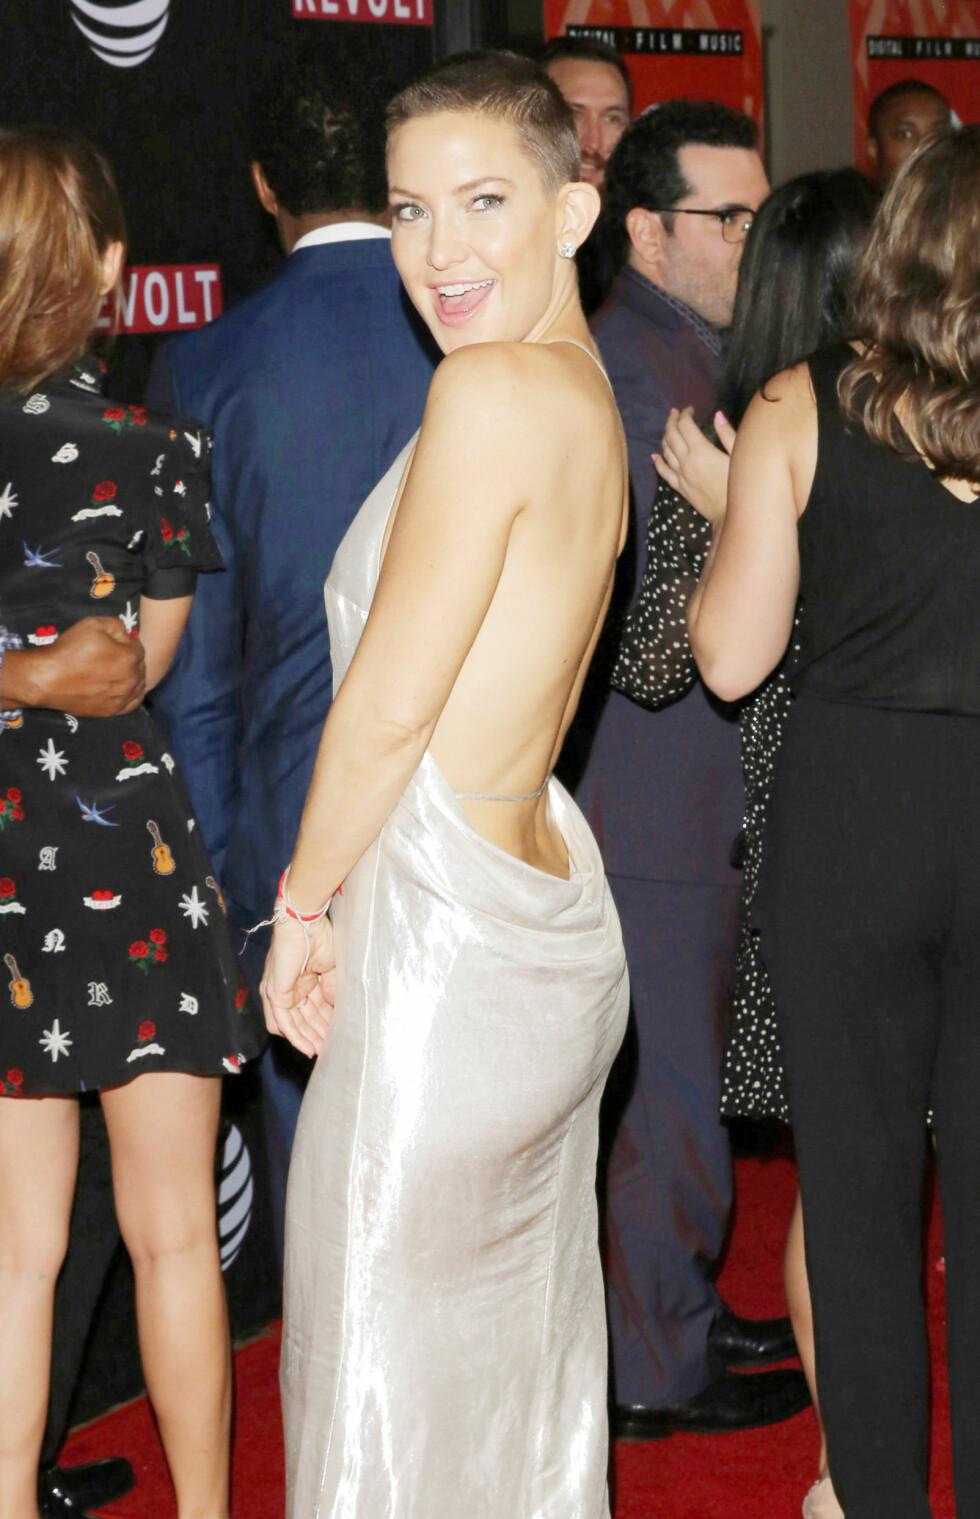 EDGY: I juli klippet Kate Hudson bort sine lange lokker. Foto: NTB Scanpix